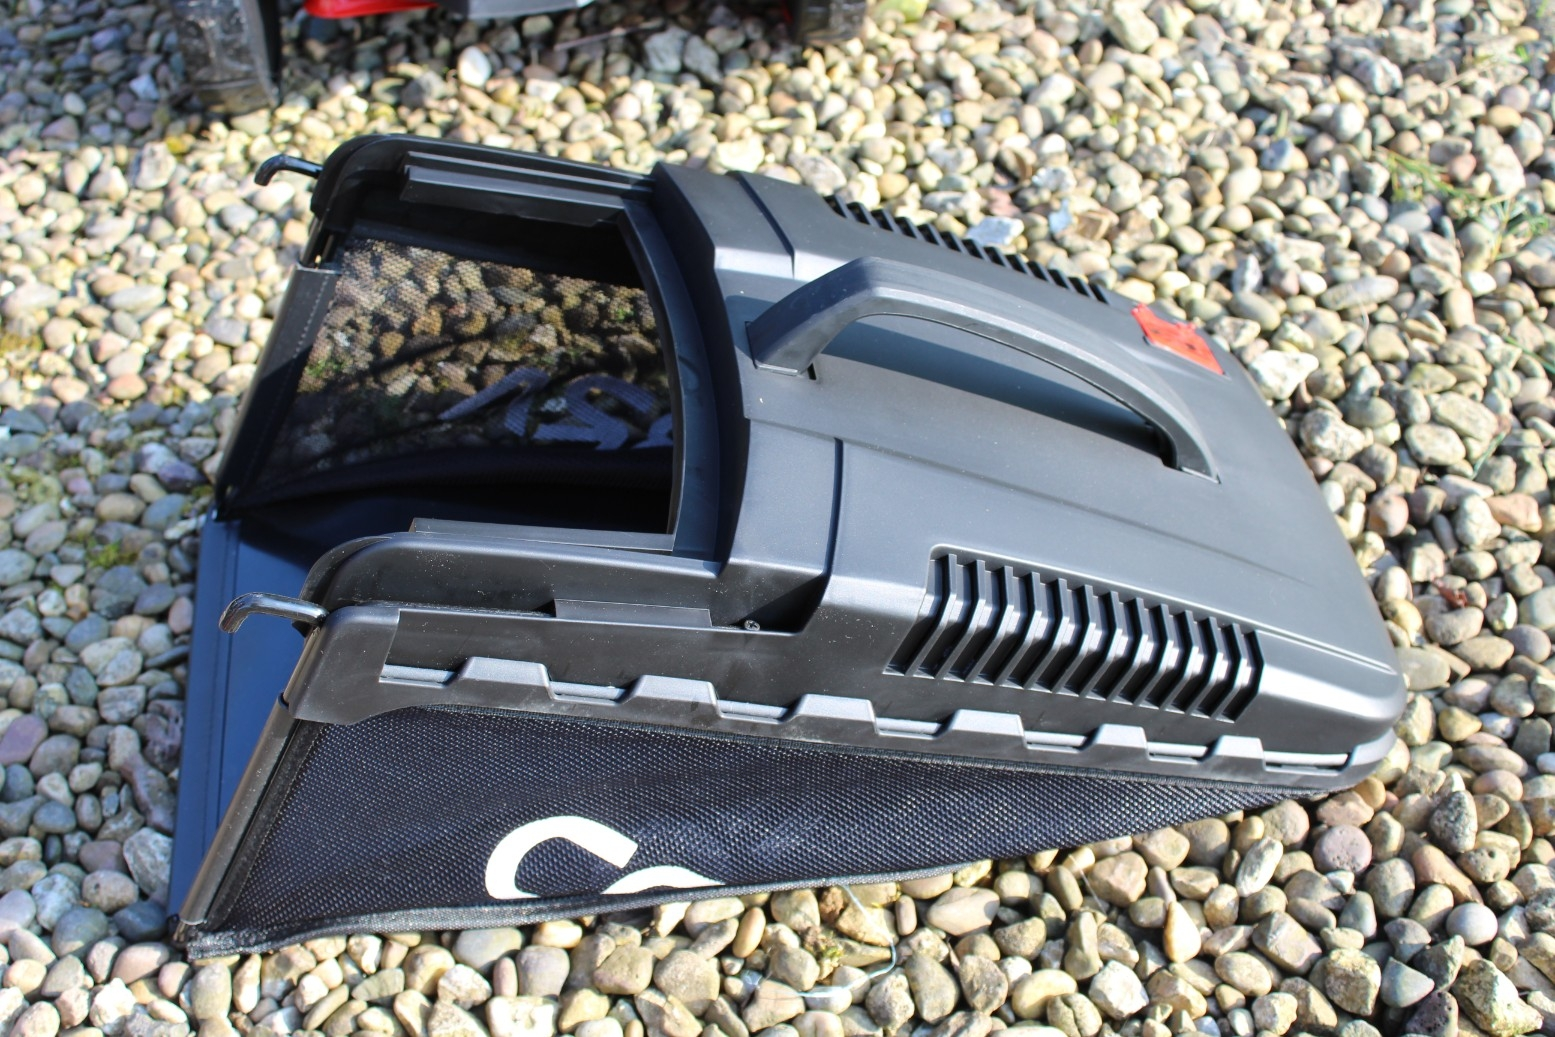 Cobra MX4140V Lithium-ion 40V Cordless Lawnmower - Review (8)